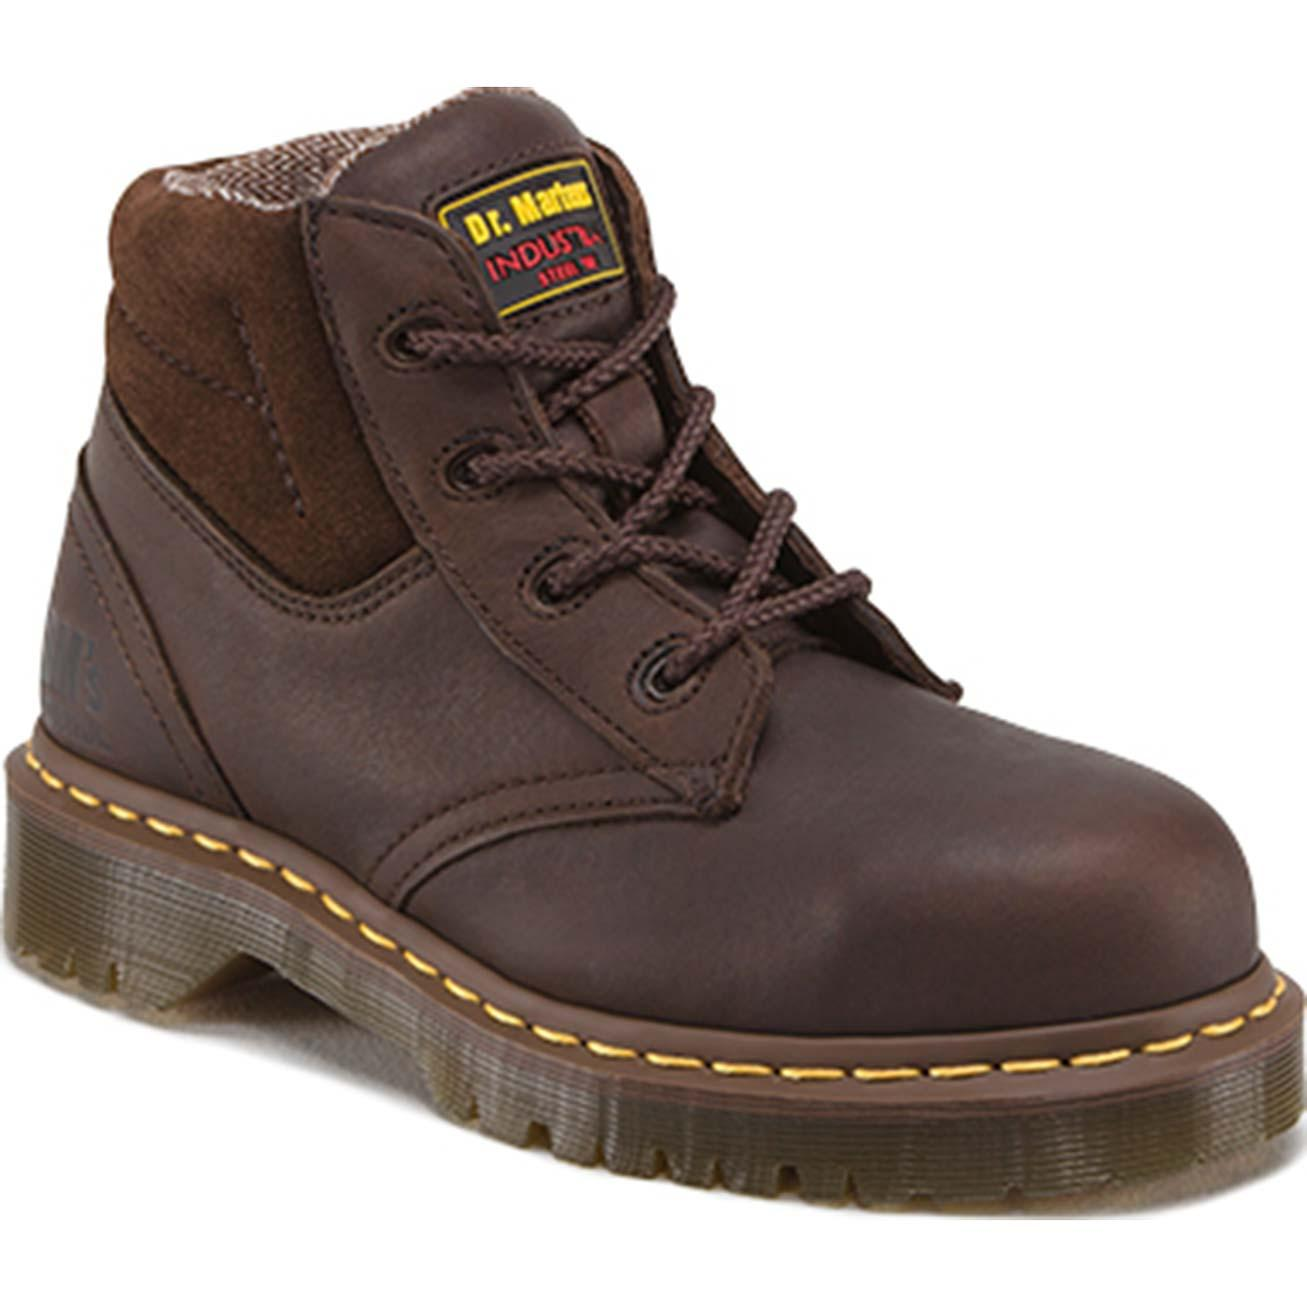 huge range of hot sale online exclusive range Dr. Martens Icon 7B09 Unisex Steel Toe Work Boot